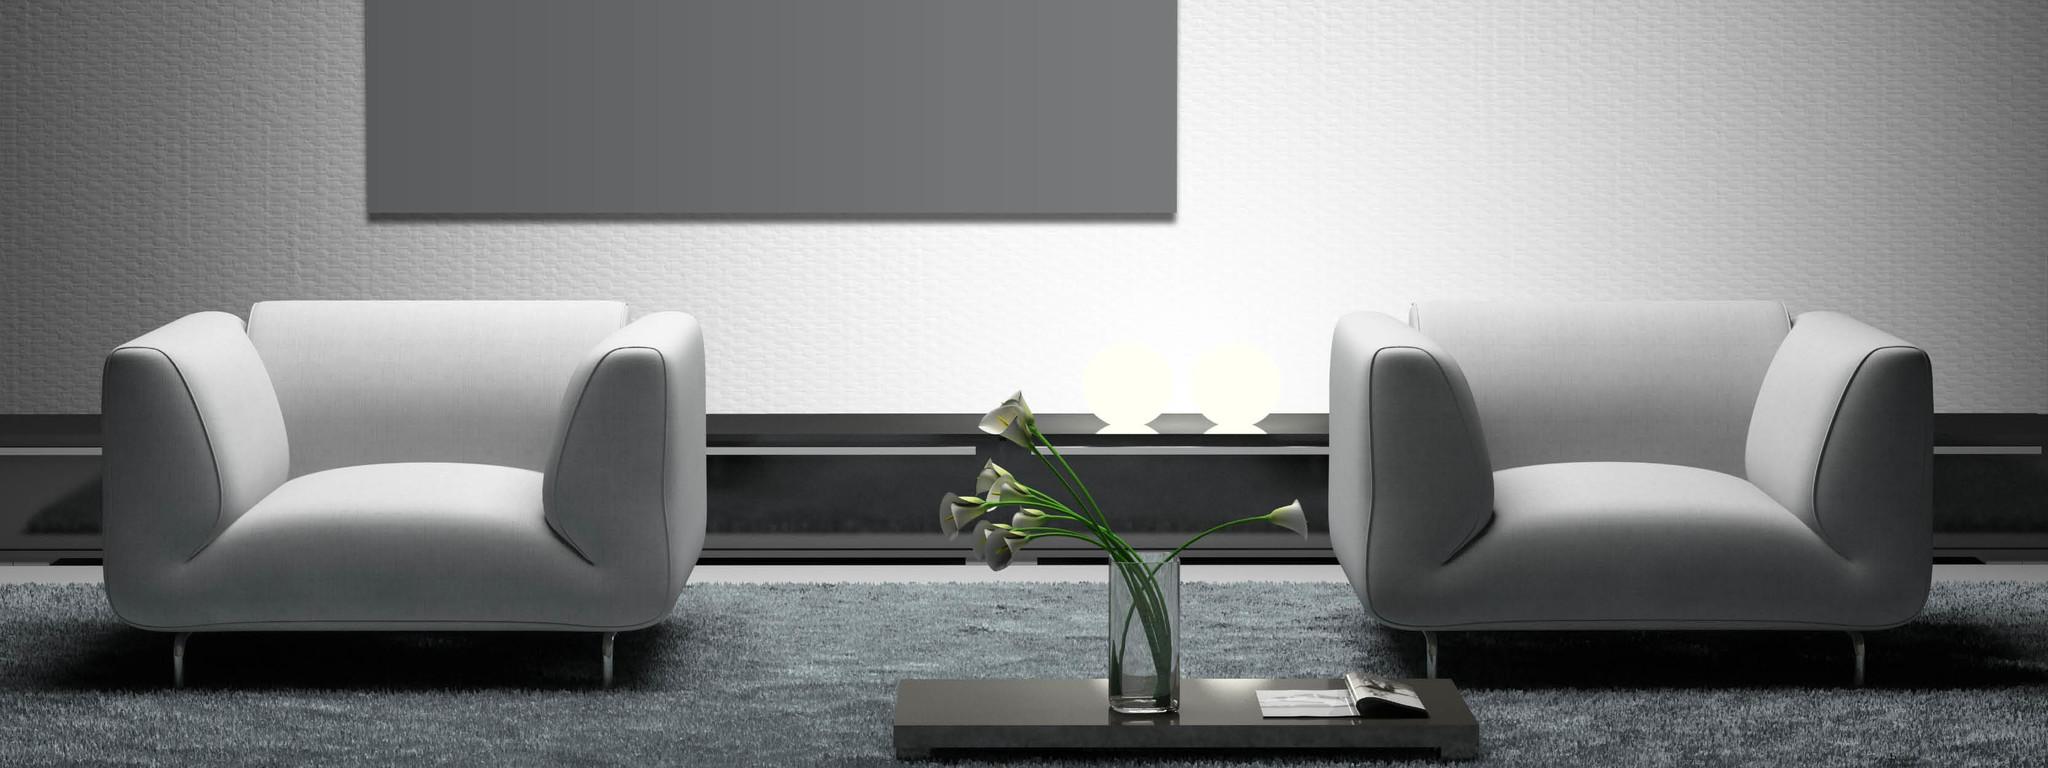 Glasweefsel en renovatie